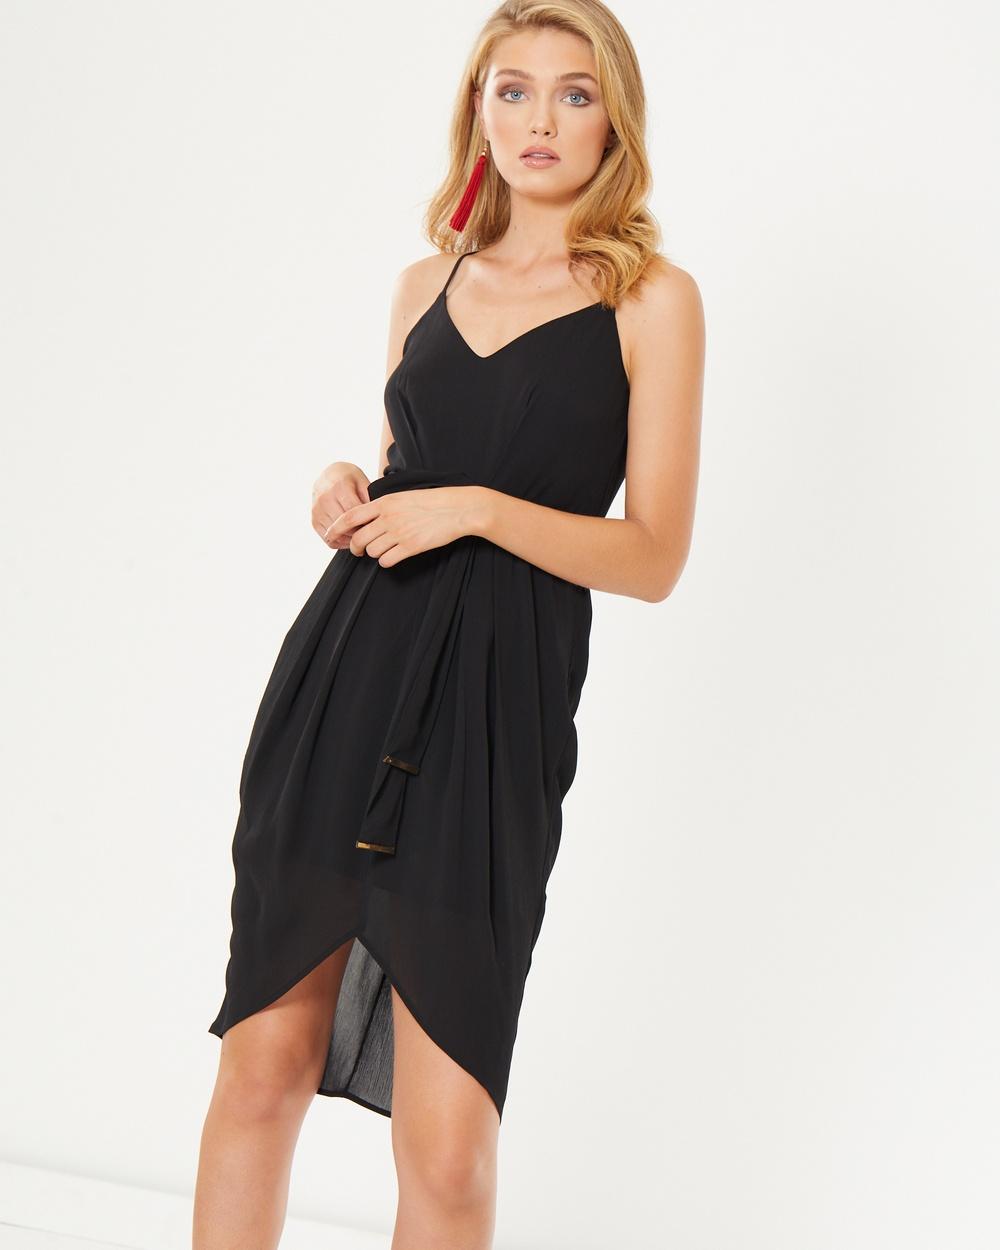 Photo of Tussah Black Celine Midi Dress - beautiful dress from Tussah online